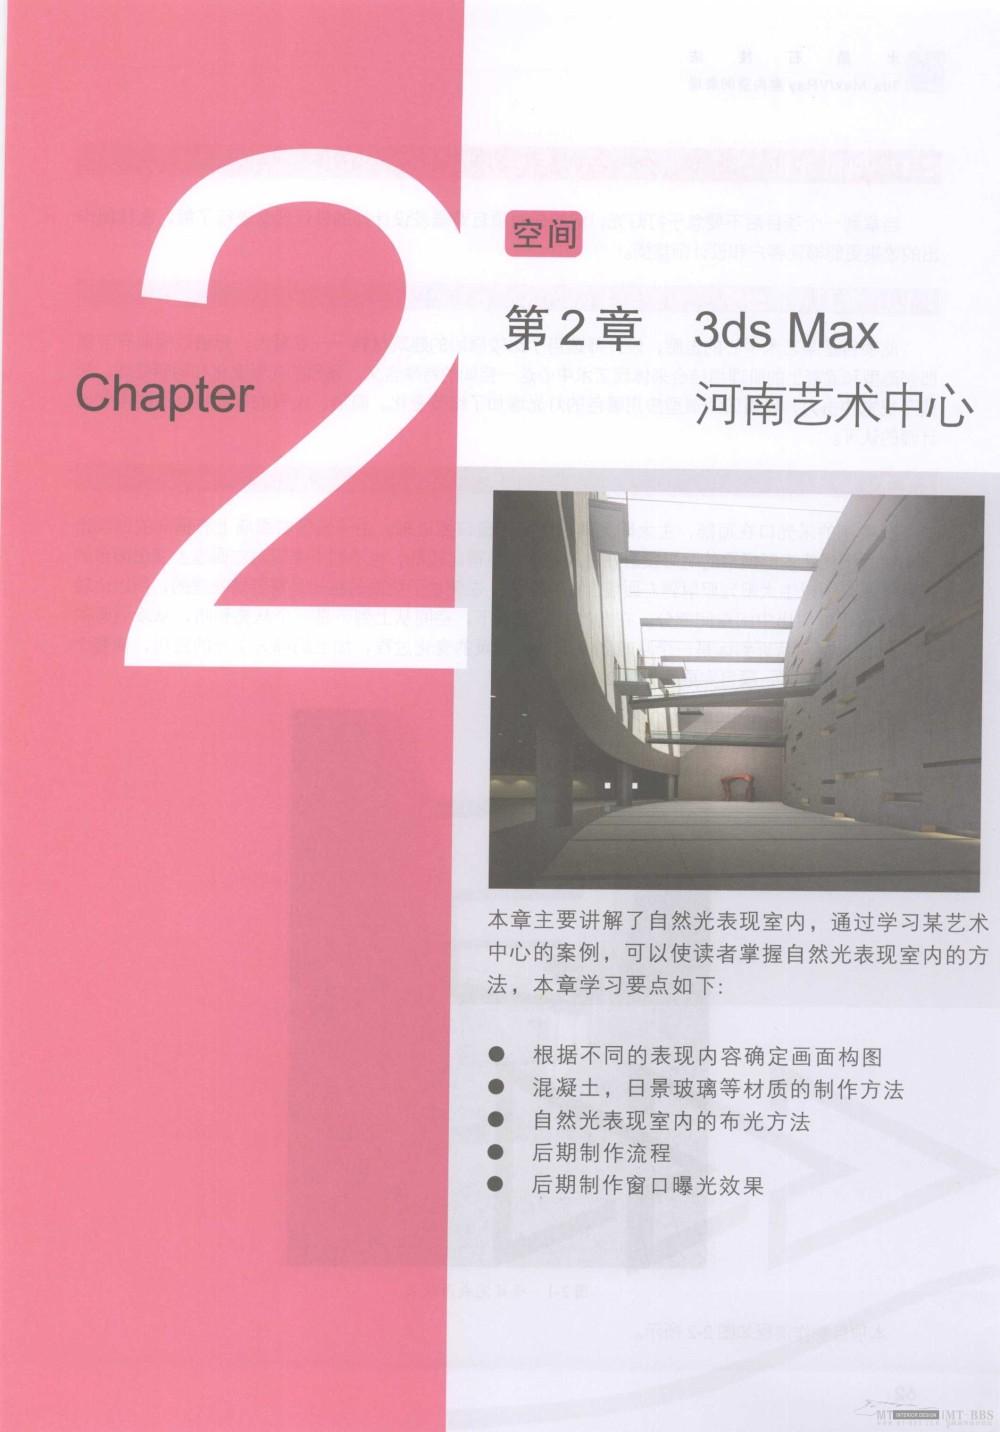 水晶石技法-3ds_Max&VRay室内空间表现_水晶石技法-3ds_Max&VRay室内空间表现_页面_067.jpg